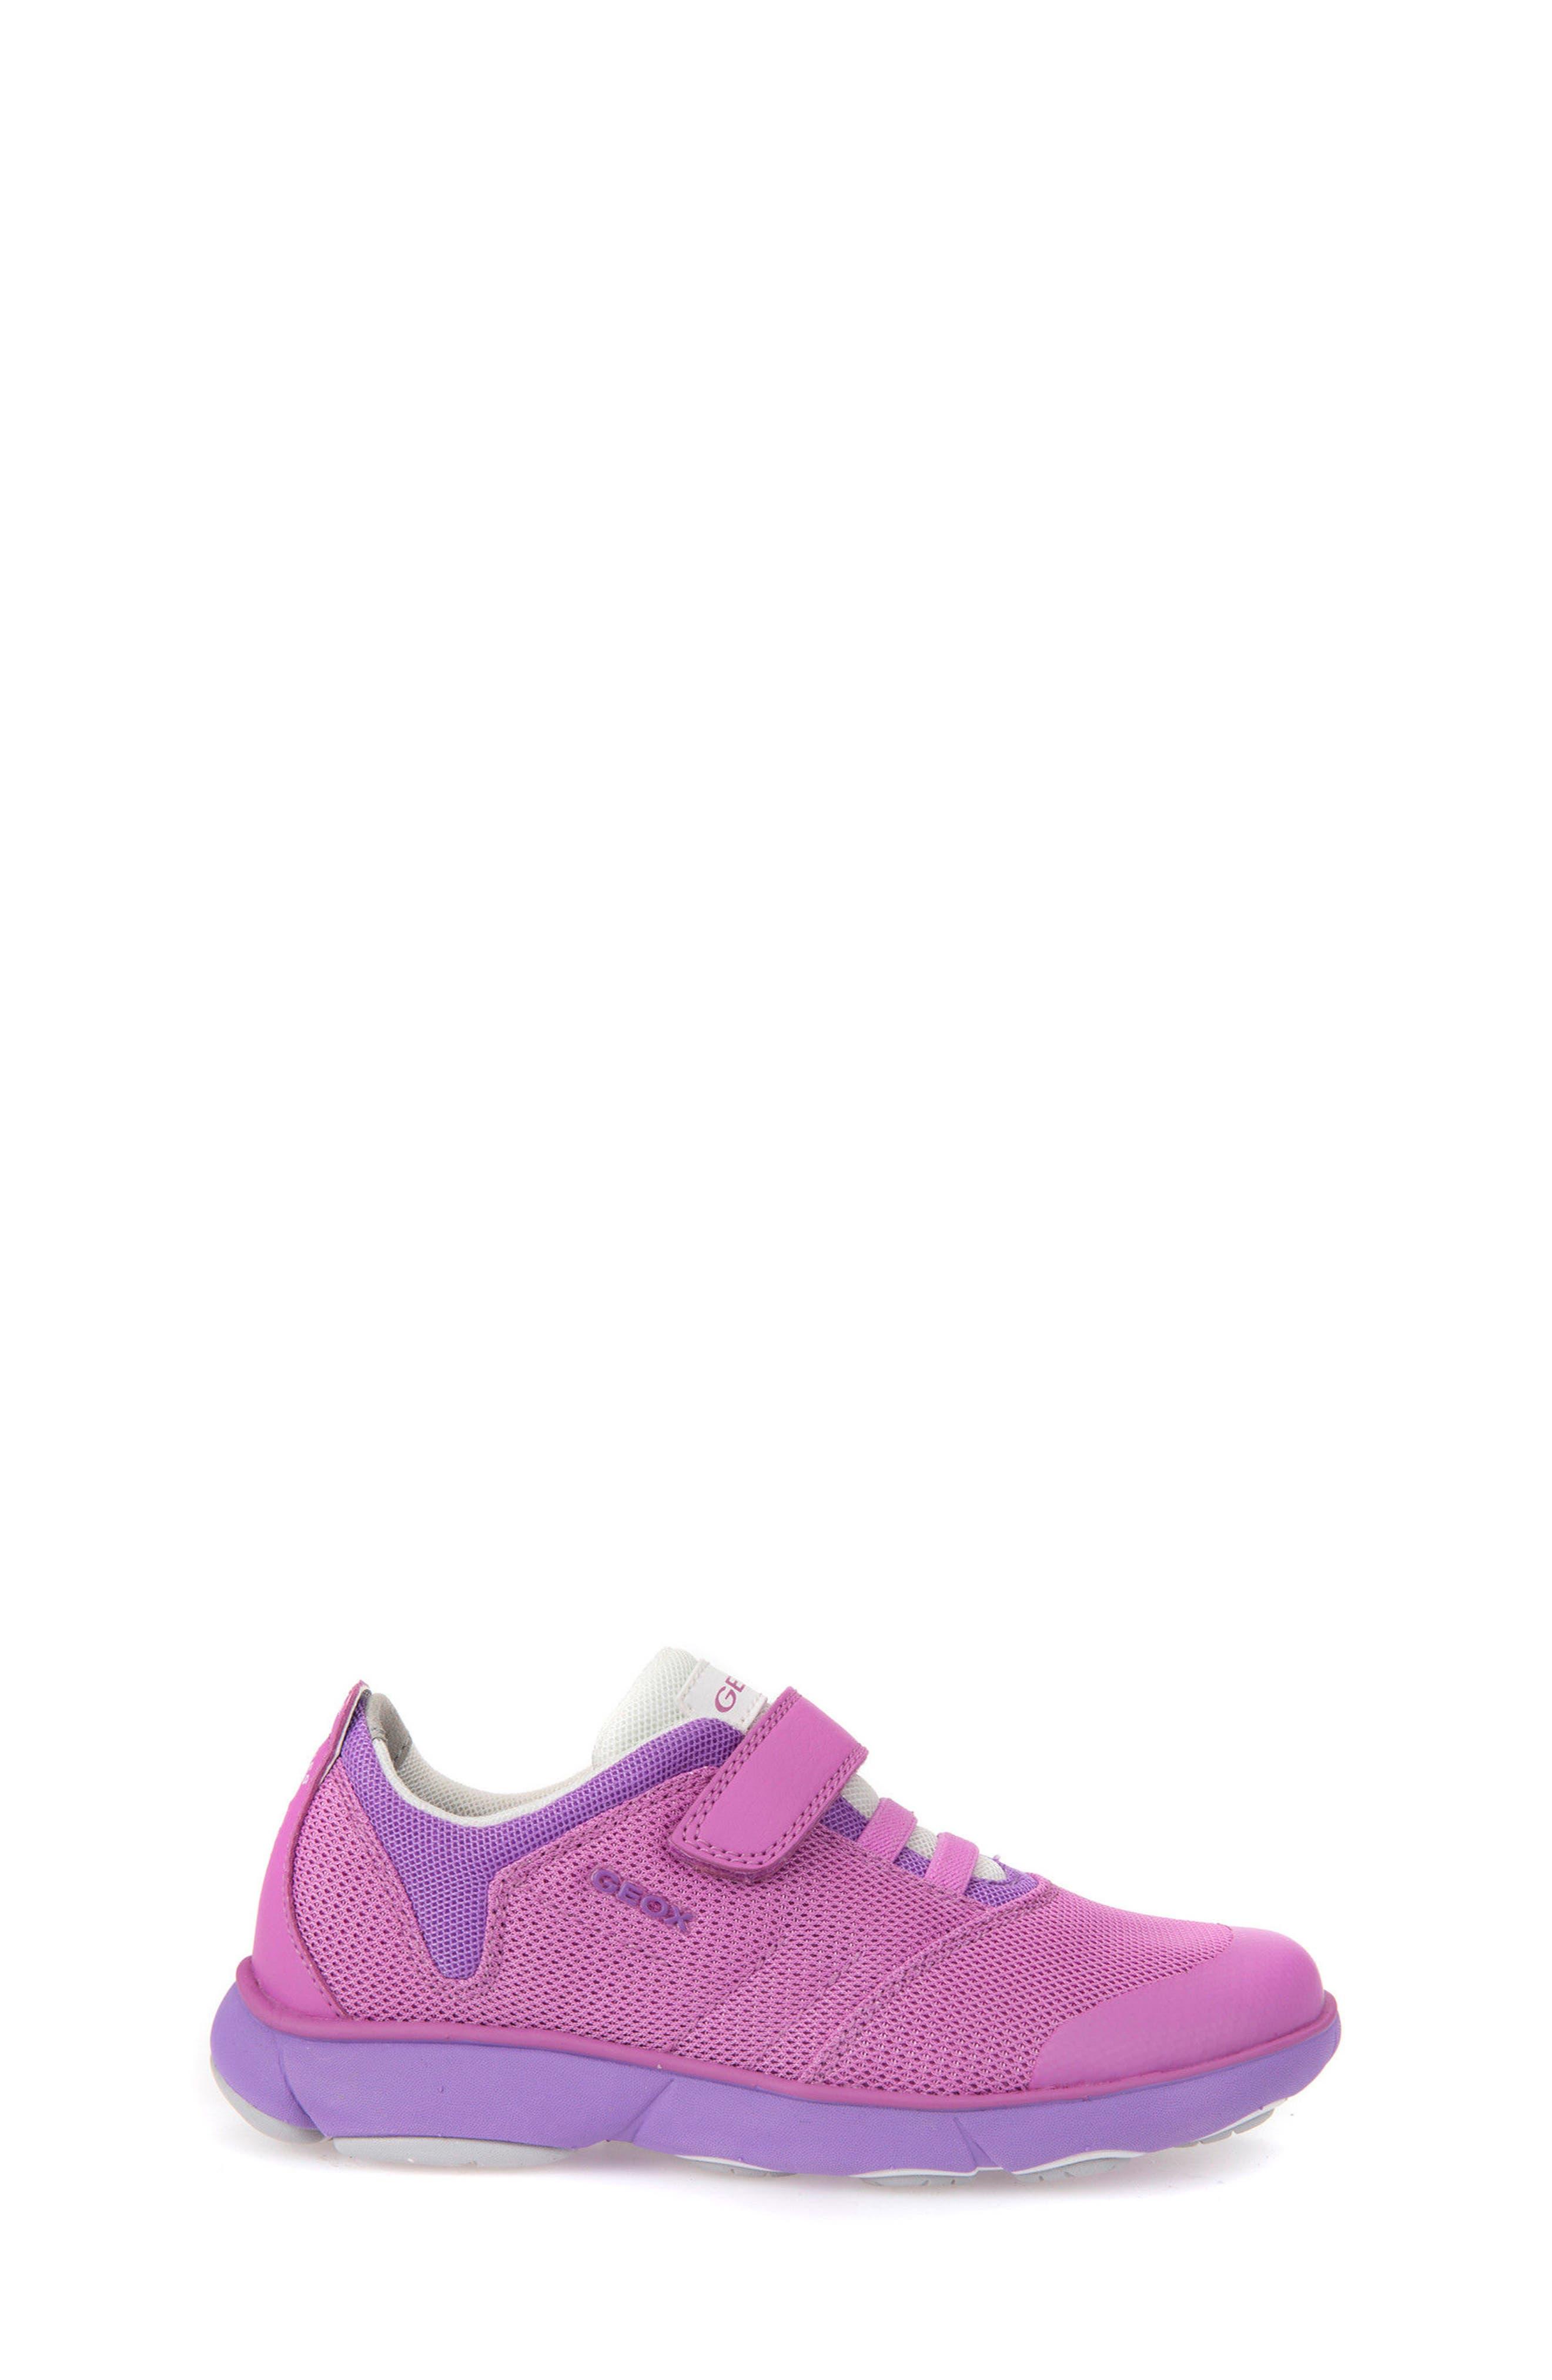 Jr Nebula Waterproof Sneaker,                             Alternate thumbnail 3, color,                             FUCHSIA